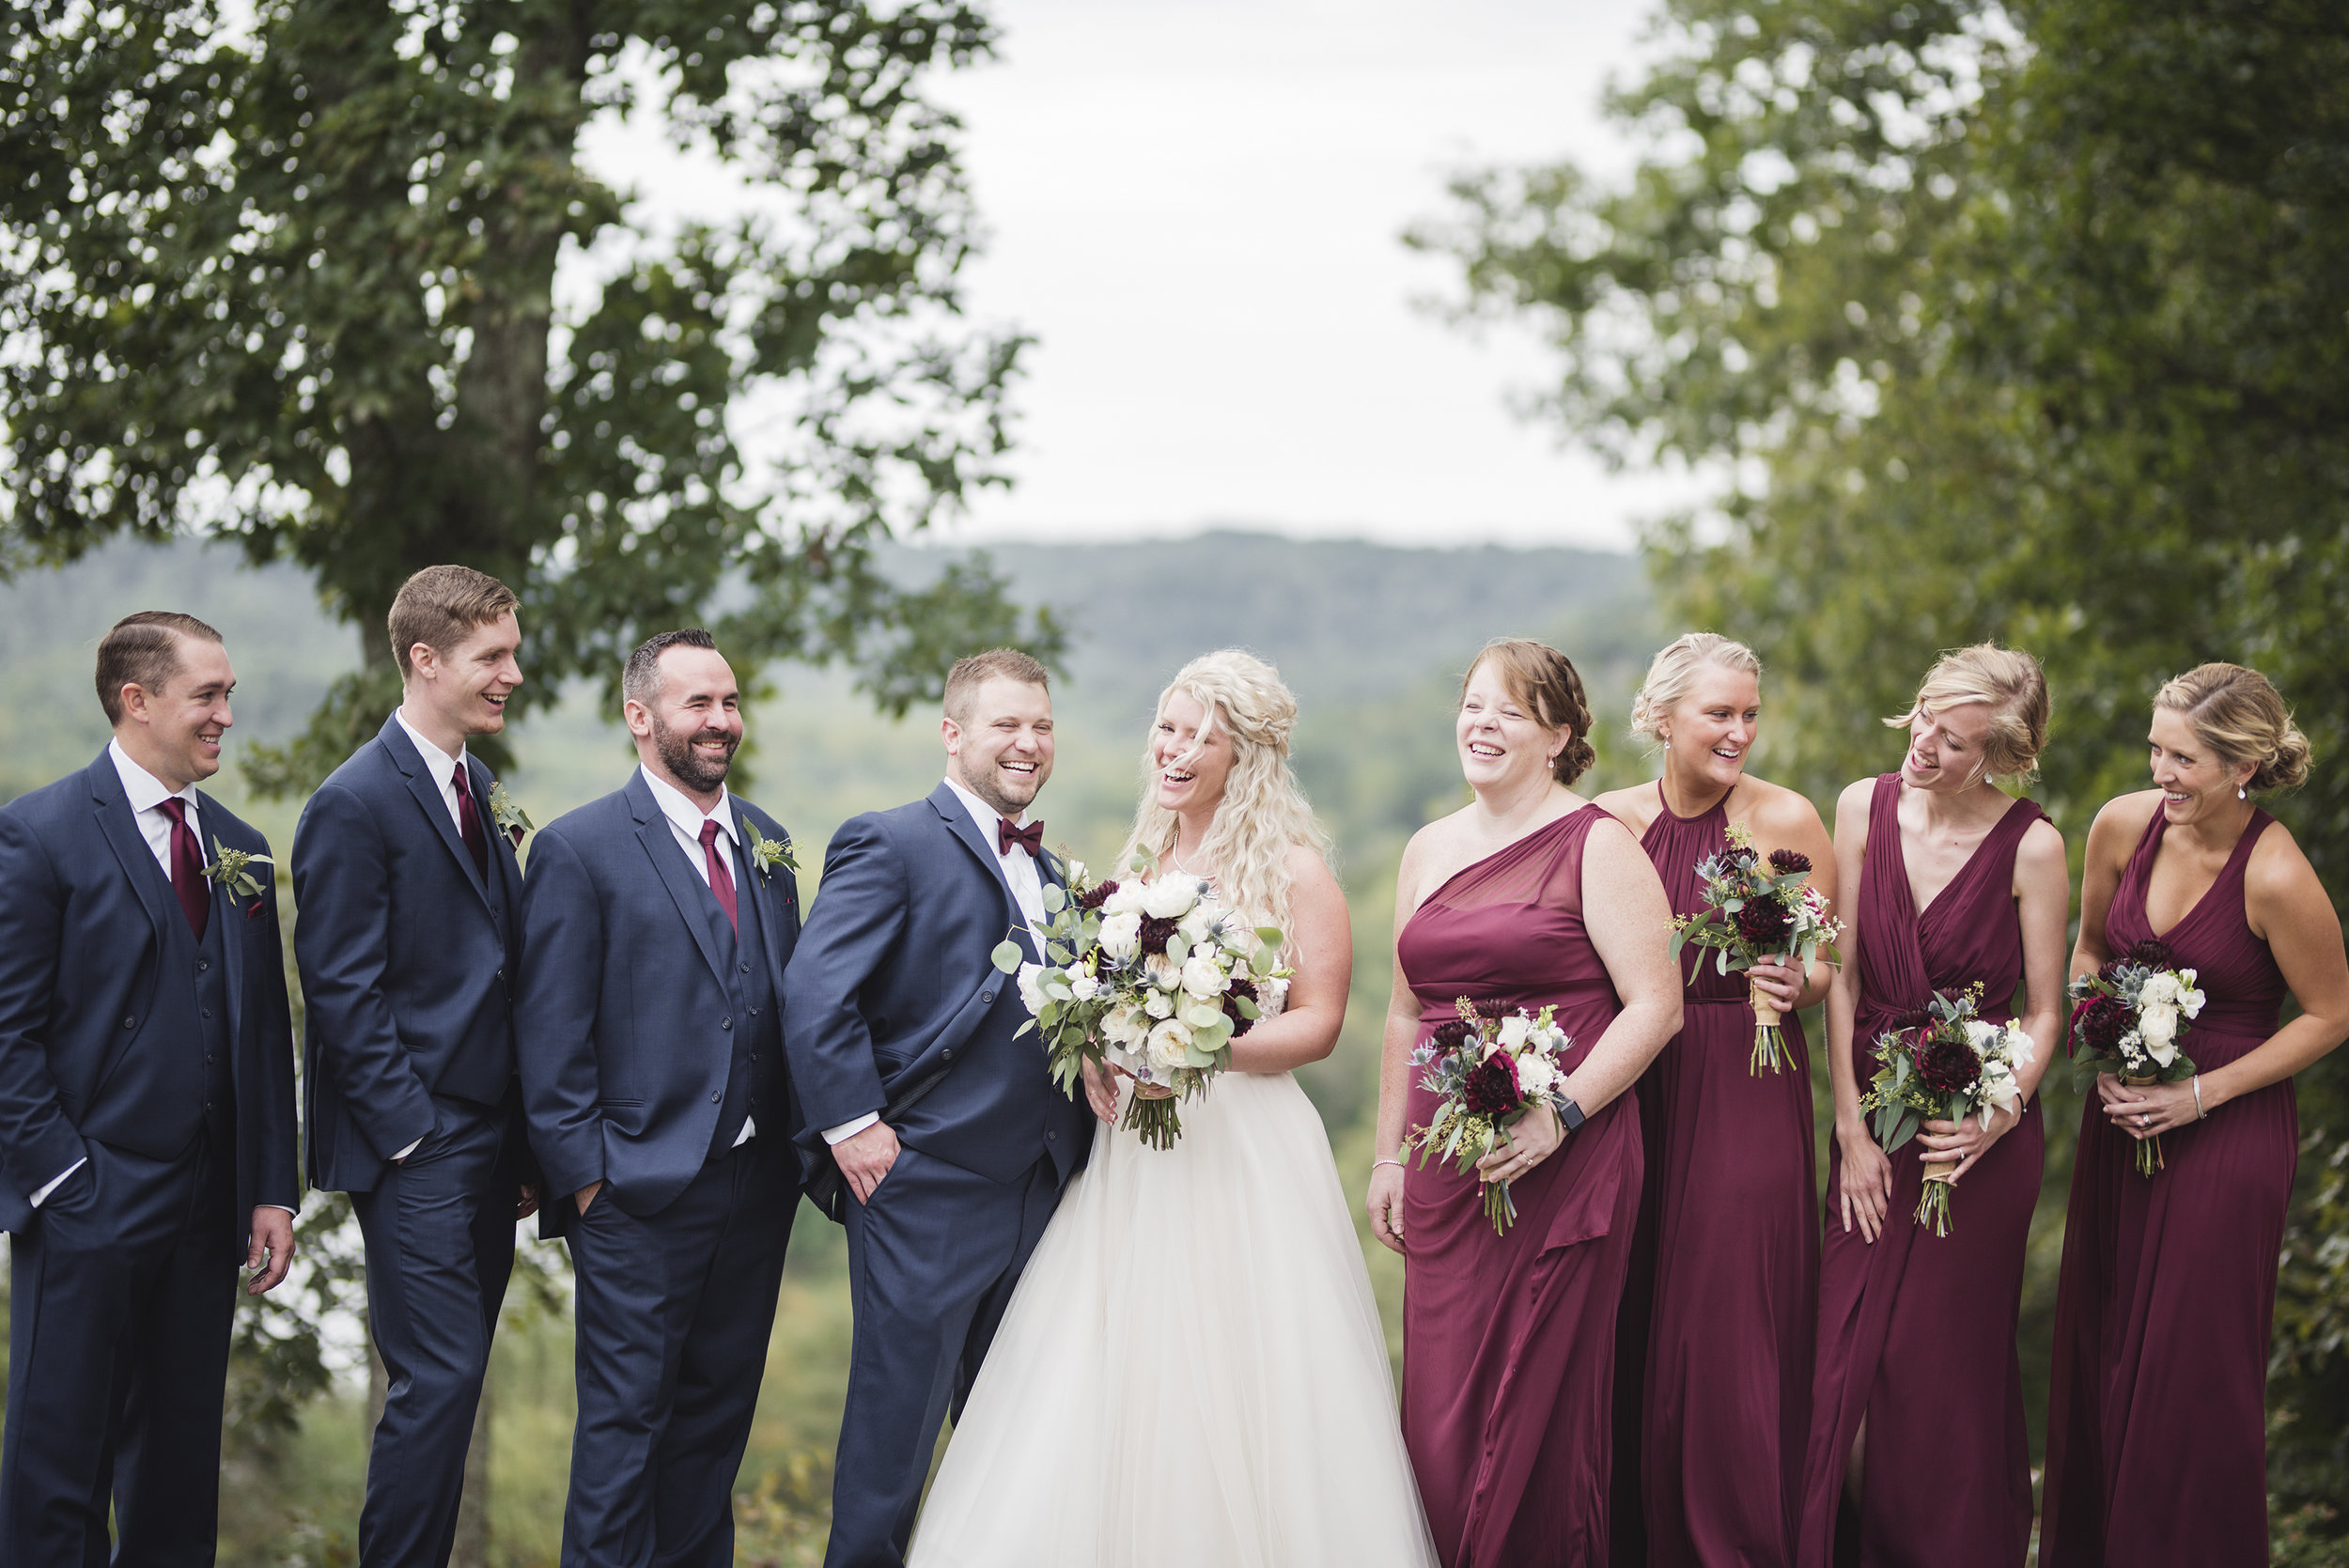 jorgensen farm wedding photographer columbus